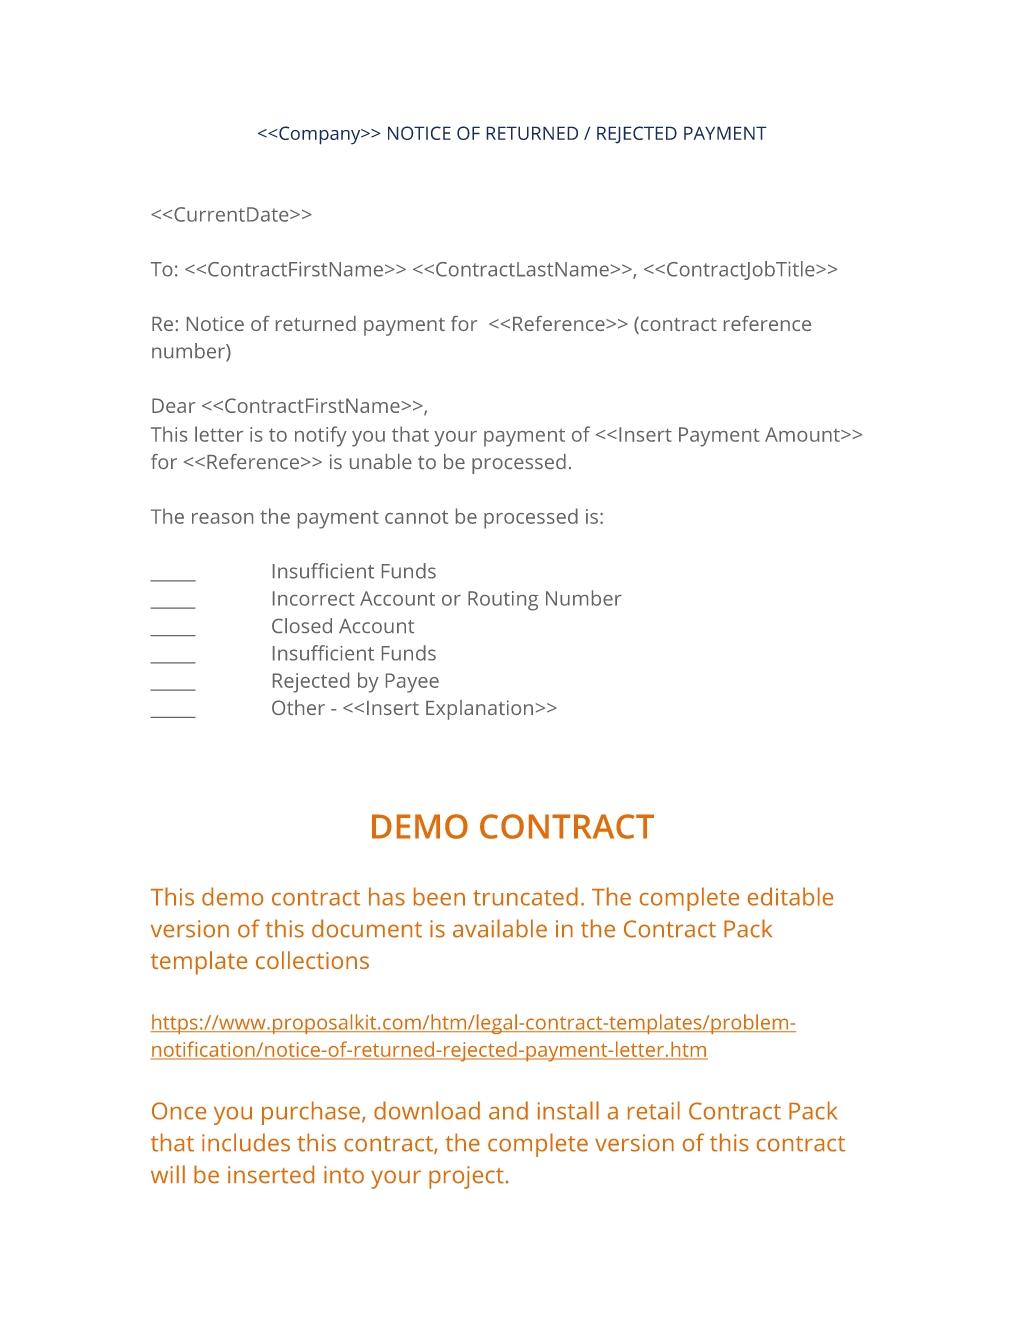 notice of rejected payment letter 3 easy steps rejection of bills letter